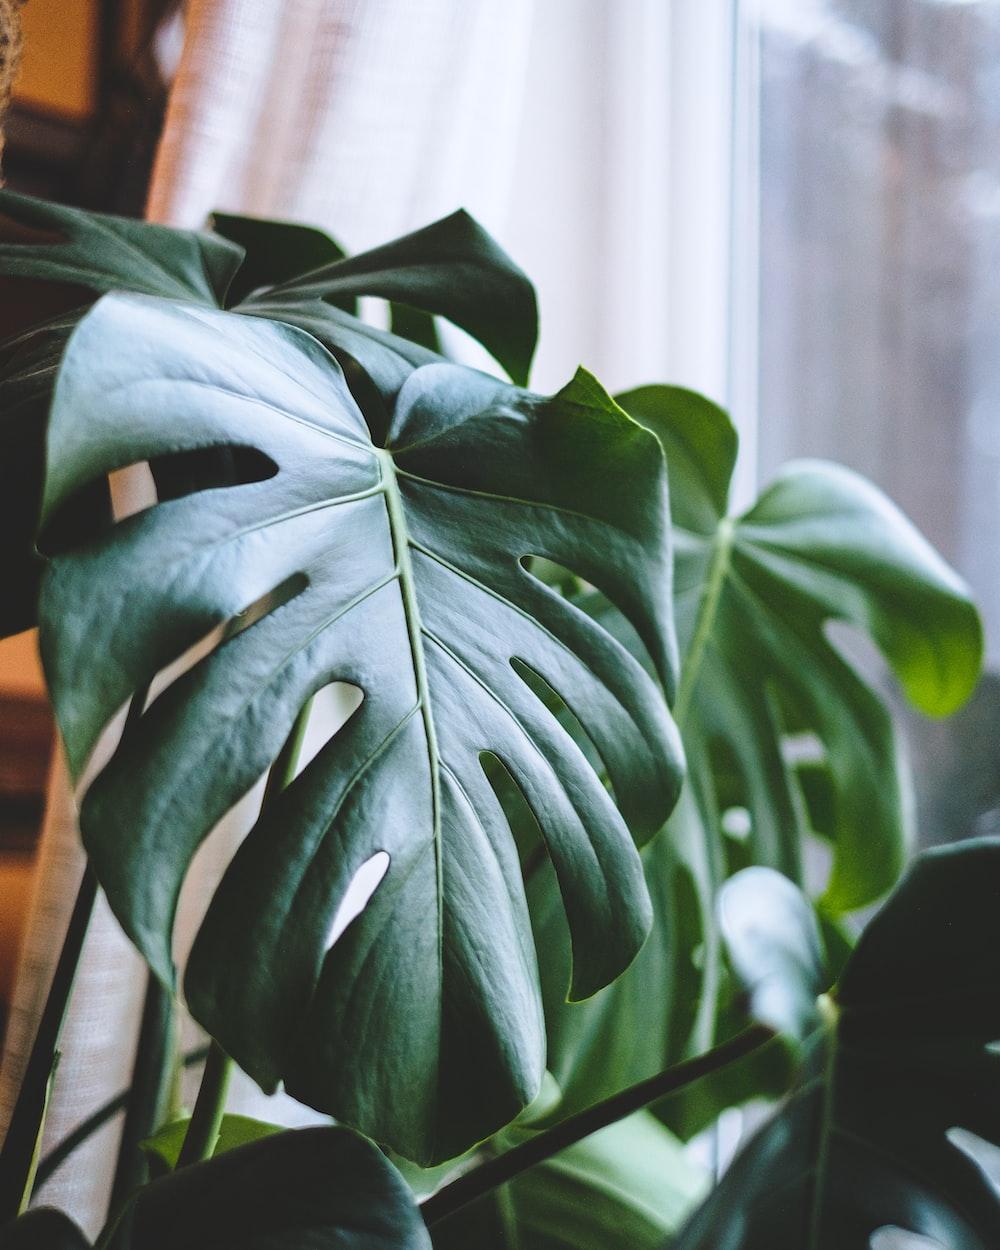 green leaf plant near white curtain